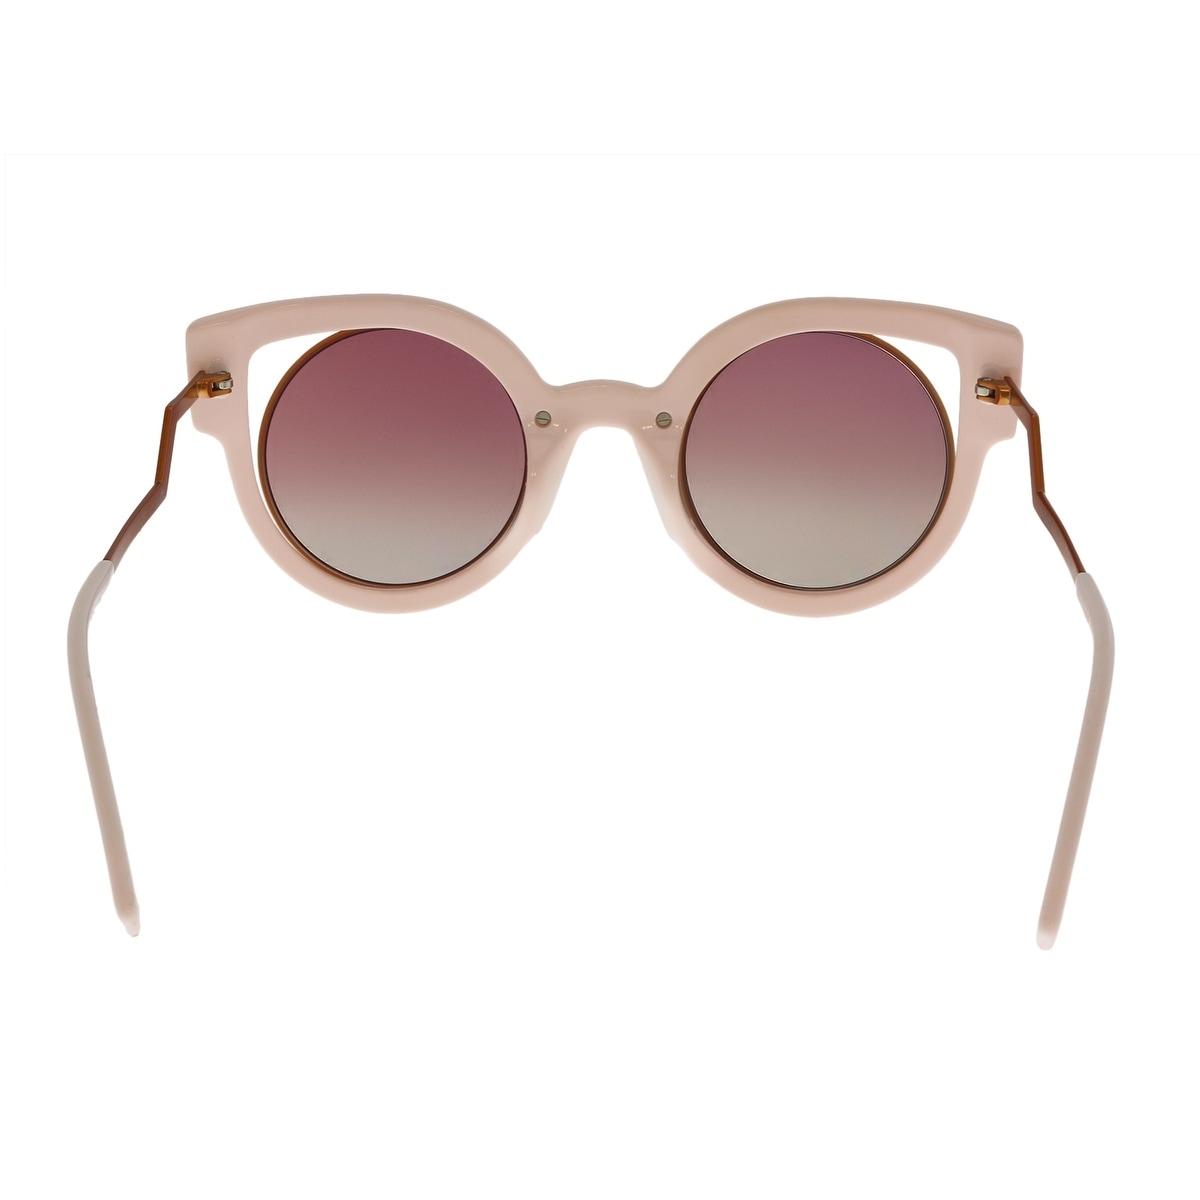 626154c1a86 Shop FENDI FF 0137 S 0NUG Orange Pink Glitter Cat Eye Sunglasses - No Size  - Free Shipping Today - Overstock - 23561240